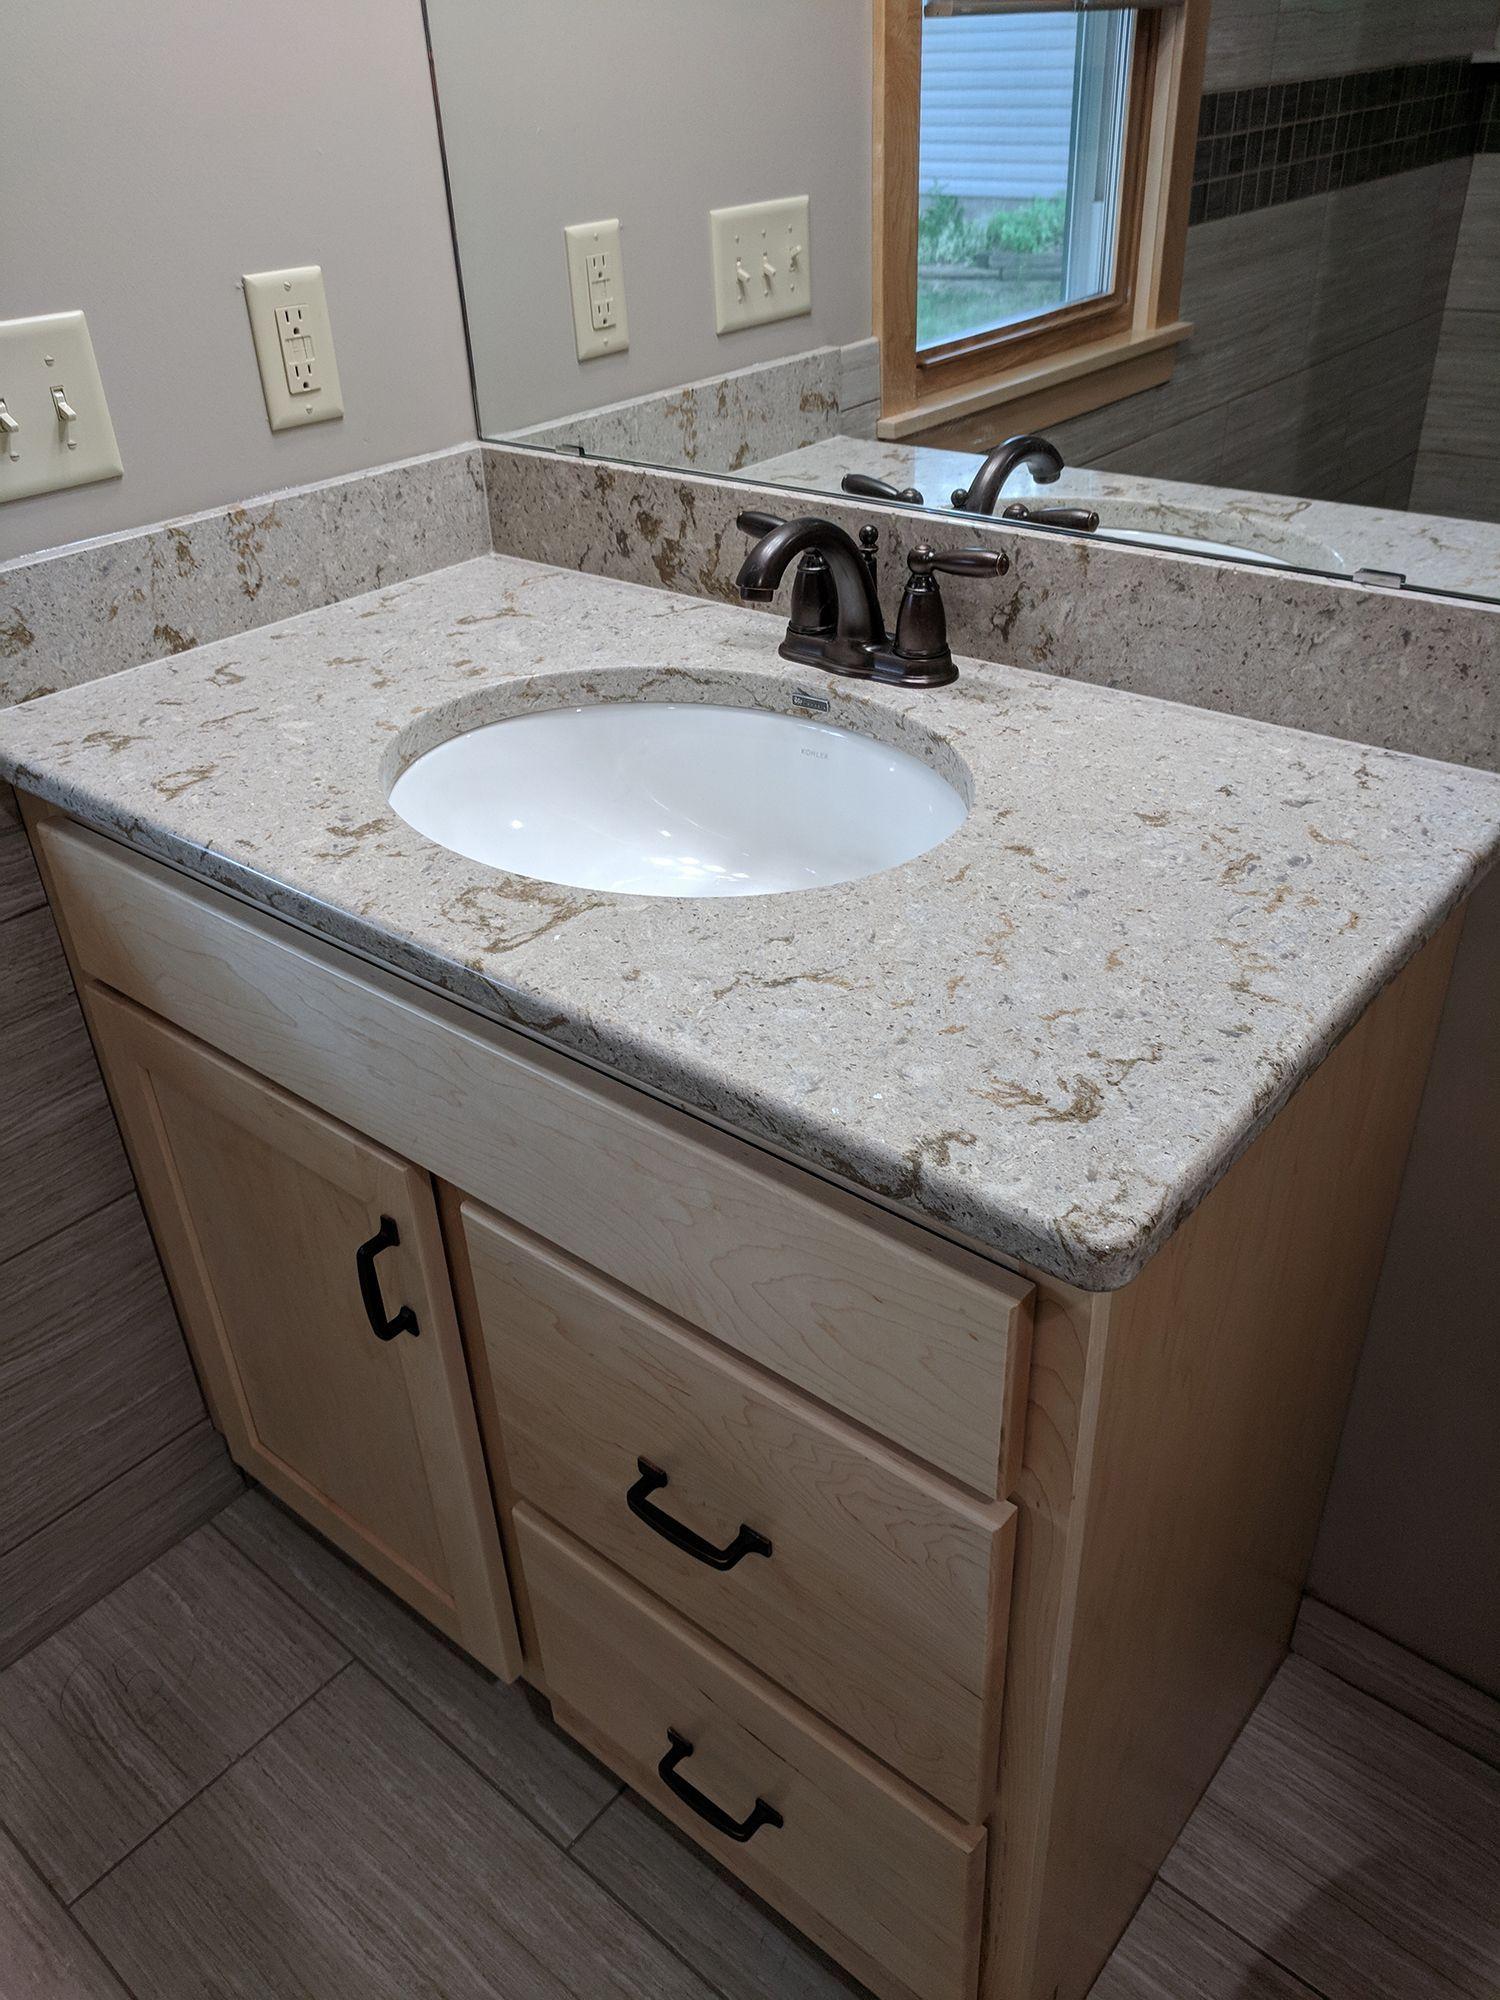 Cheap Granite Countertops Mn 2021 In 2020 Counter Top Sink